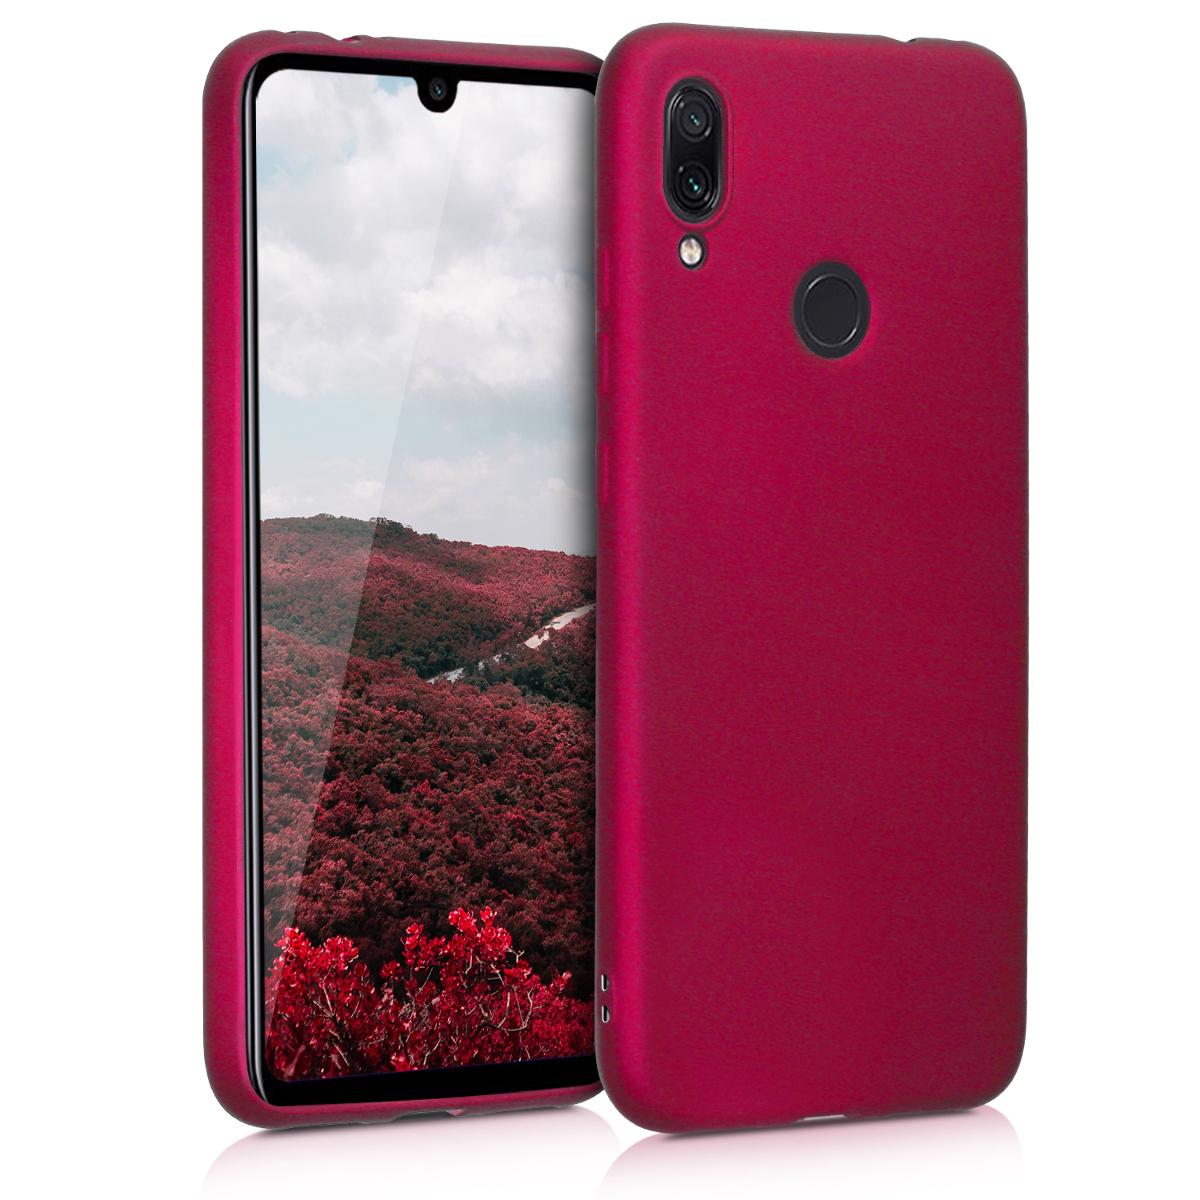 KW Θήκη Σιλικόνης Xiaomi Redmi Note 7 / Note 7 Pro - Metallic Pink (47570.65)